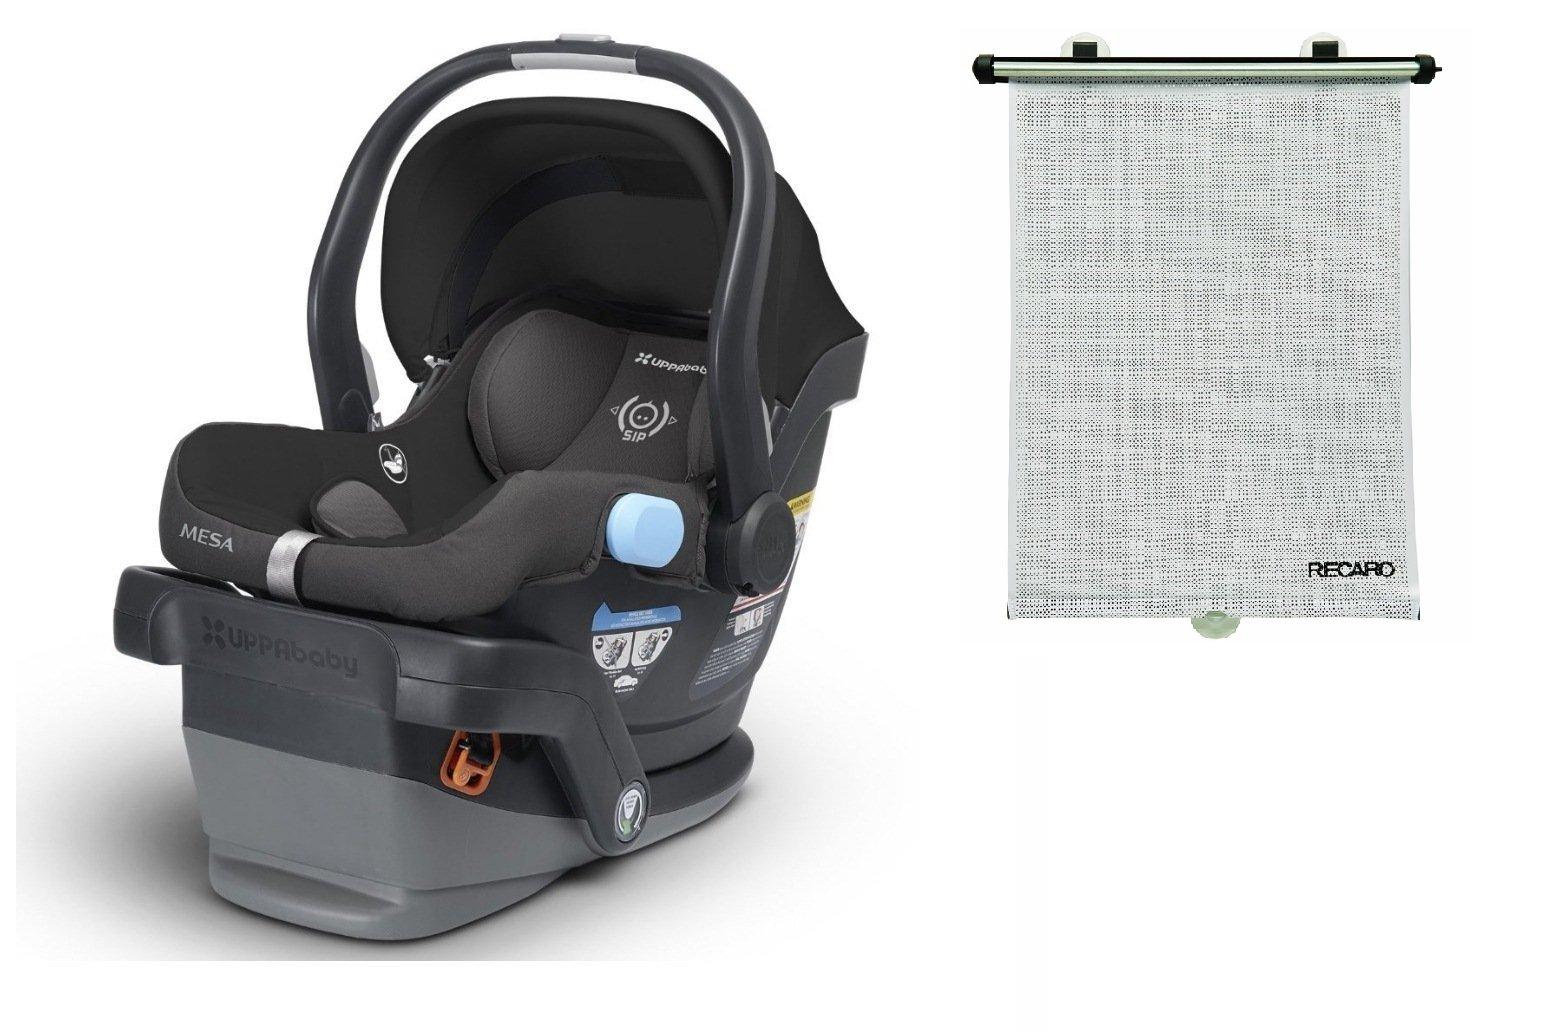 UPPAbaby MESA Infant Car Seat, Jake (Black) 2015-2016 model.